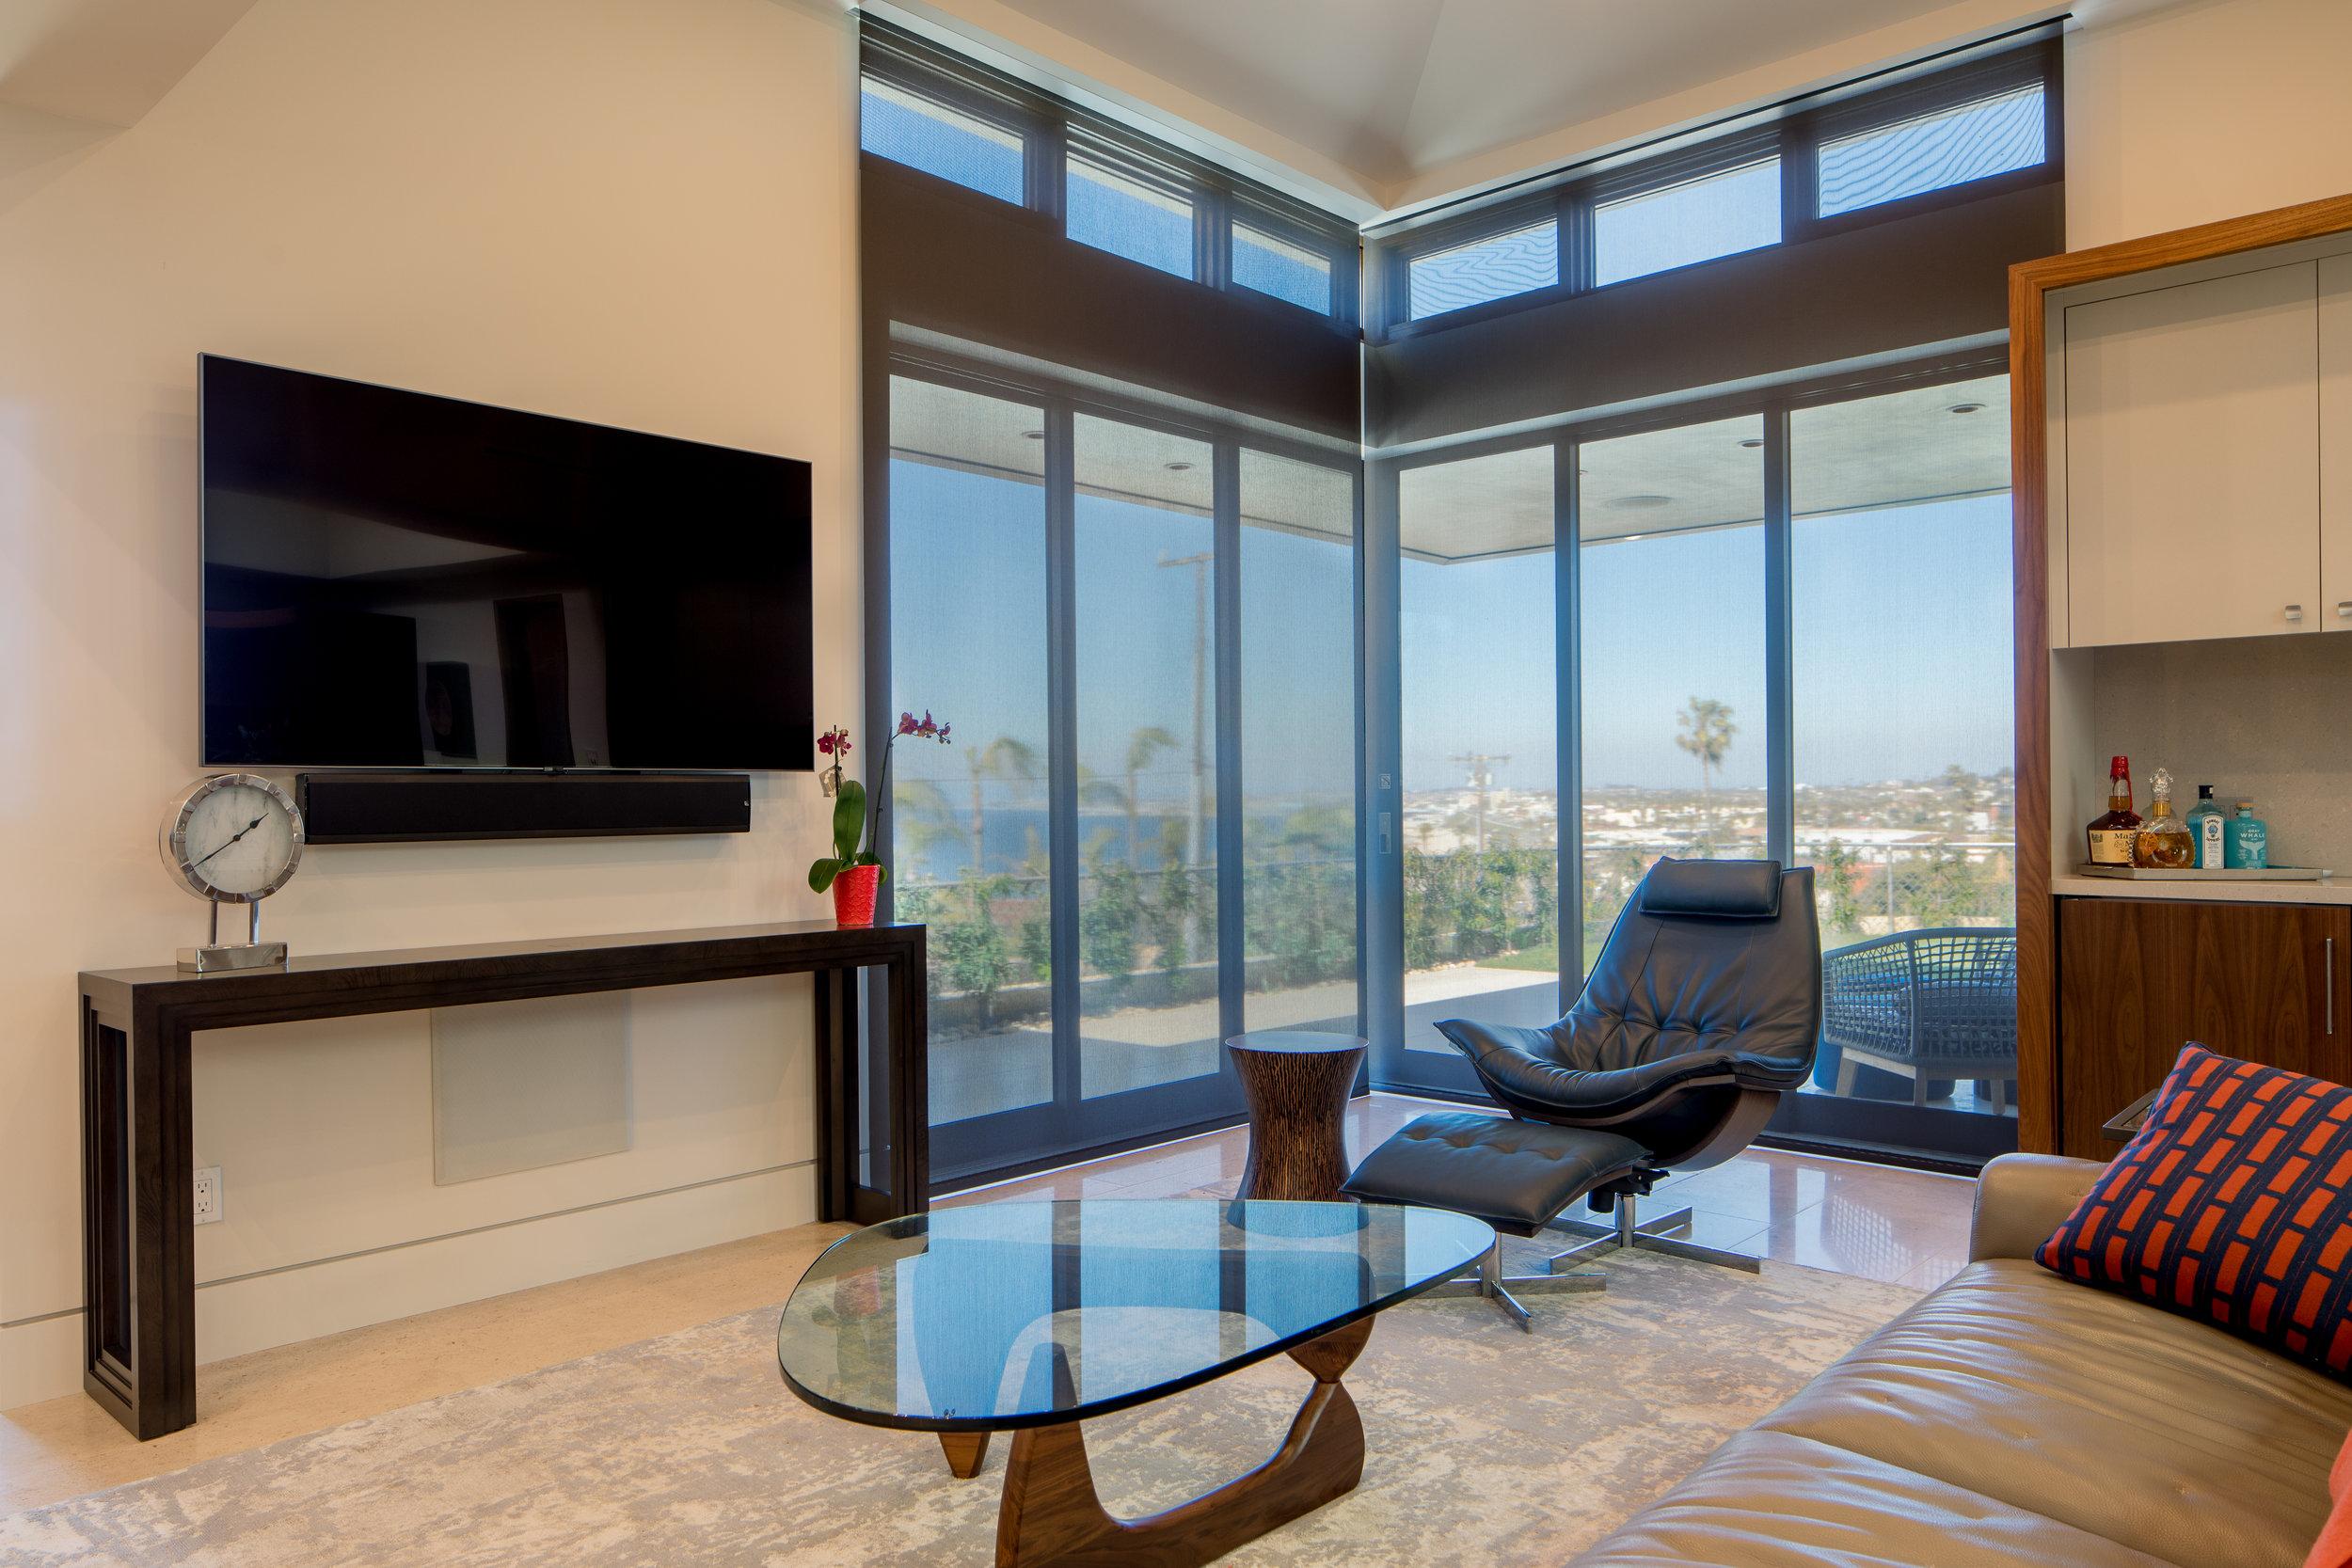 Living Room Television and Shades Closed.jpg